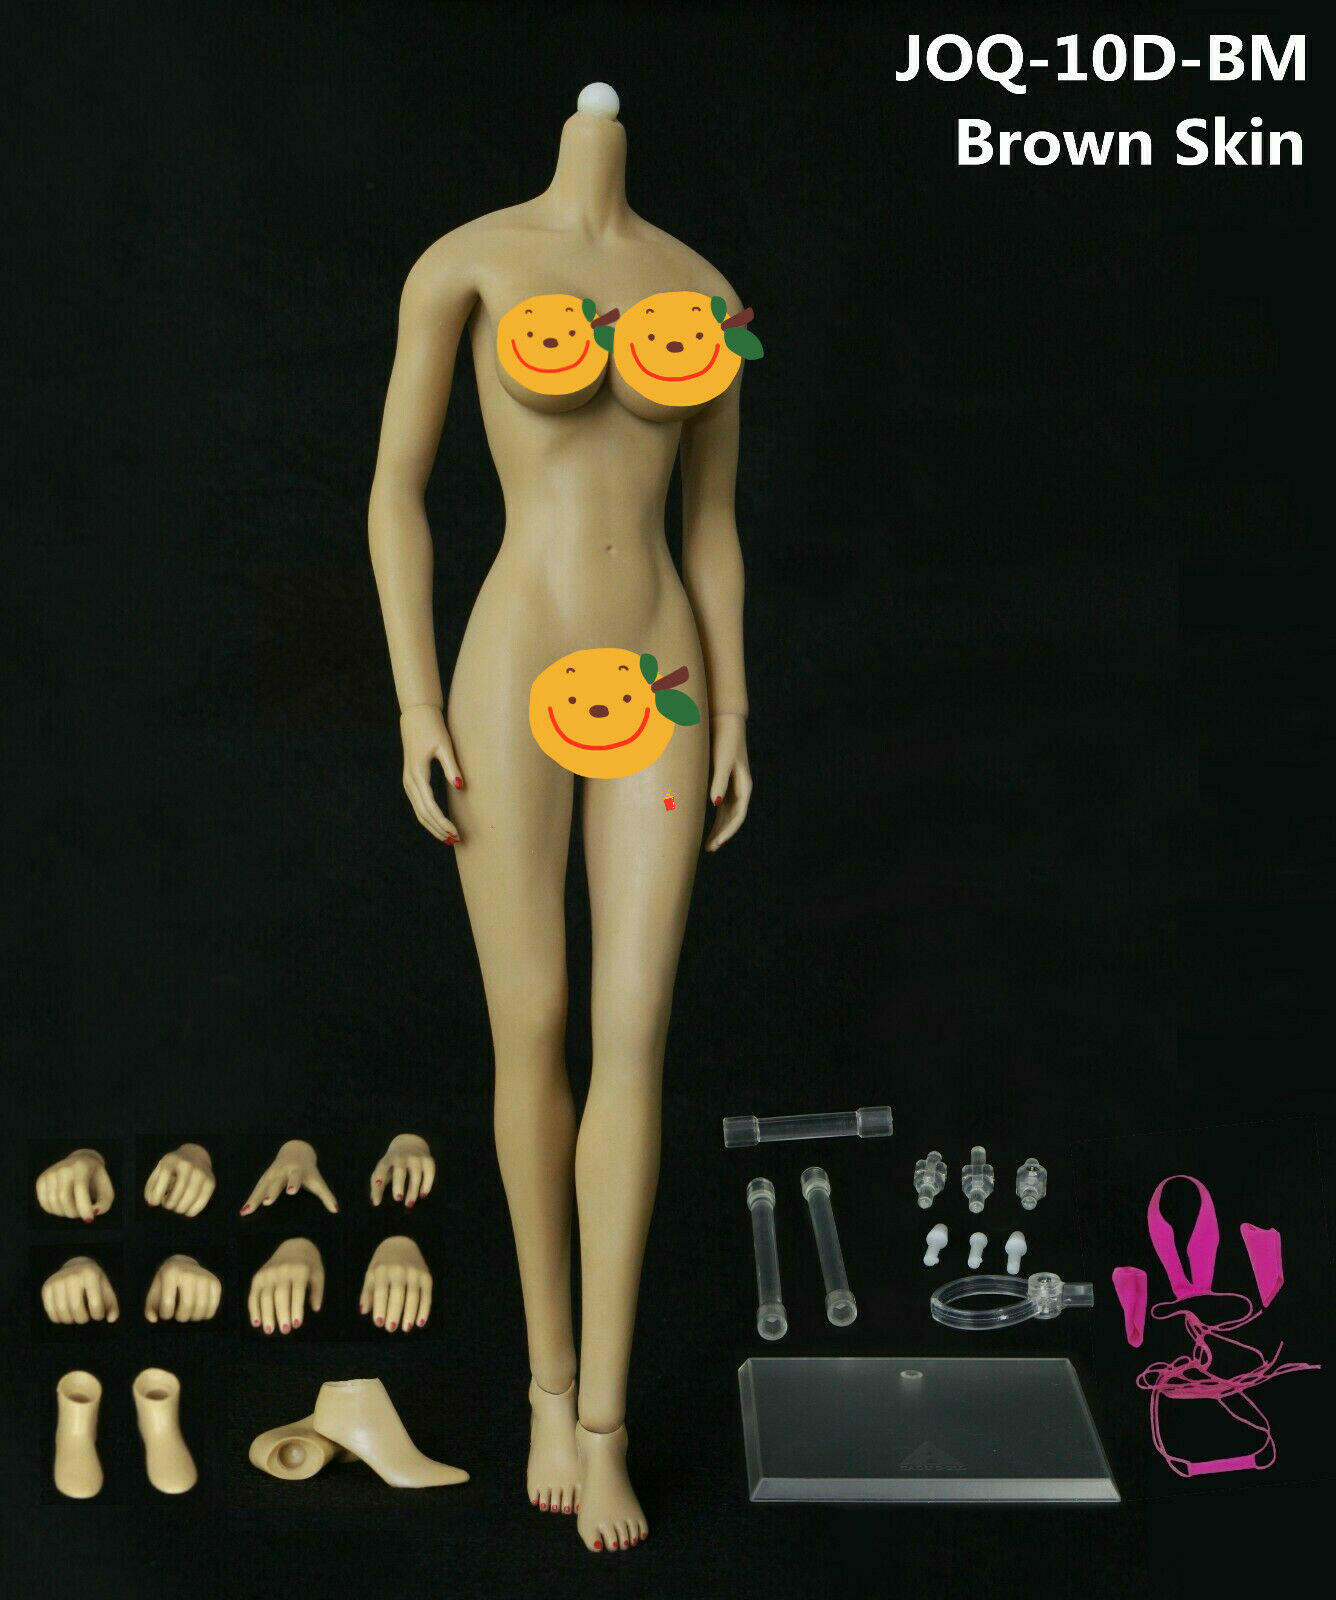 JIAOU DOLL 1 6 Female Body JOQ-10E-BM 12'' Big Bust Detachable Feet Yellow Skin